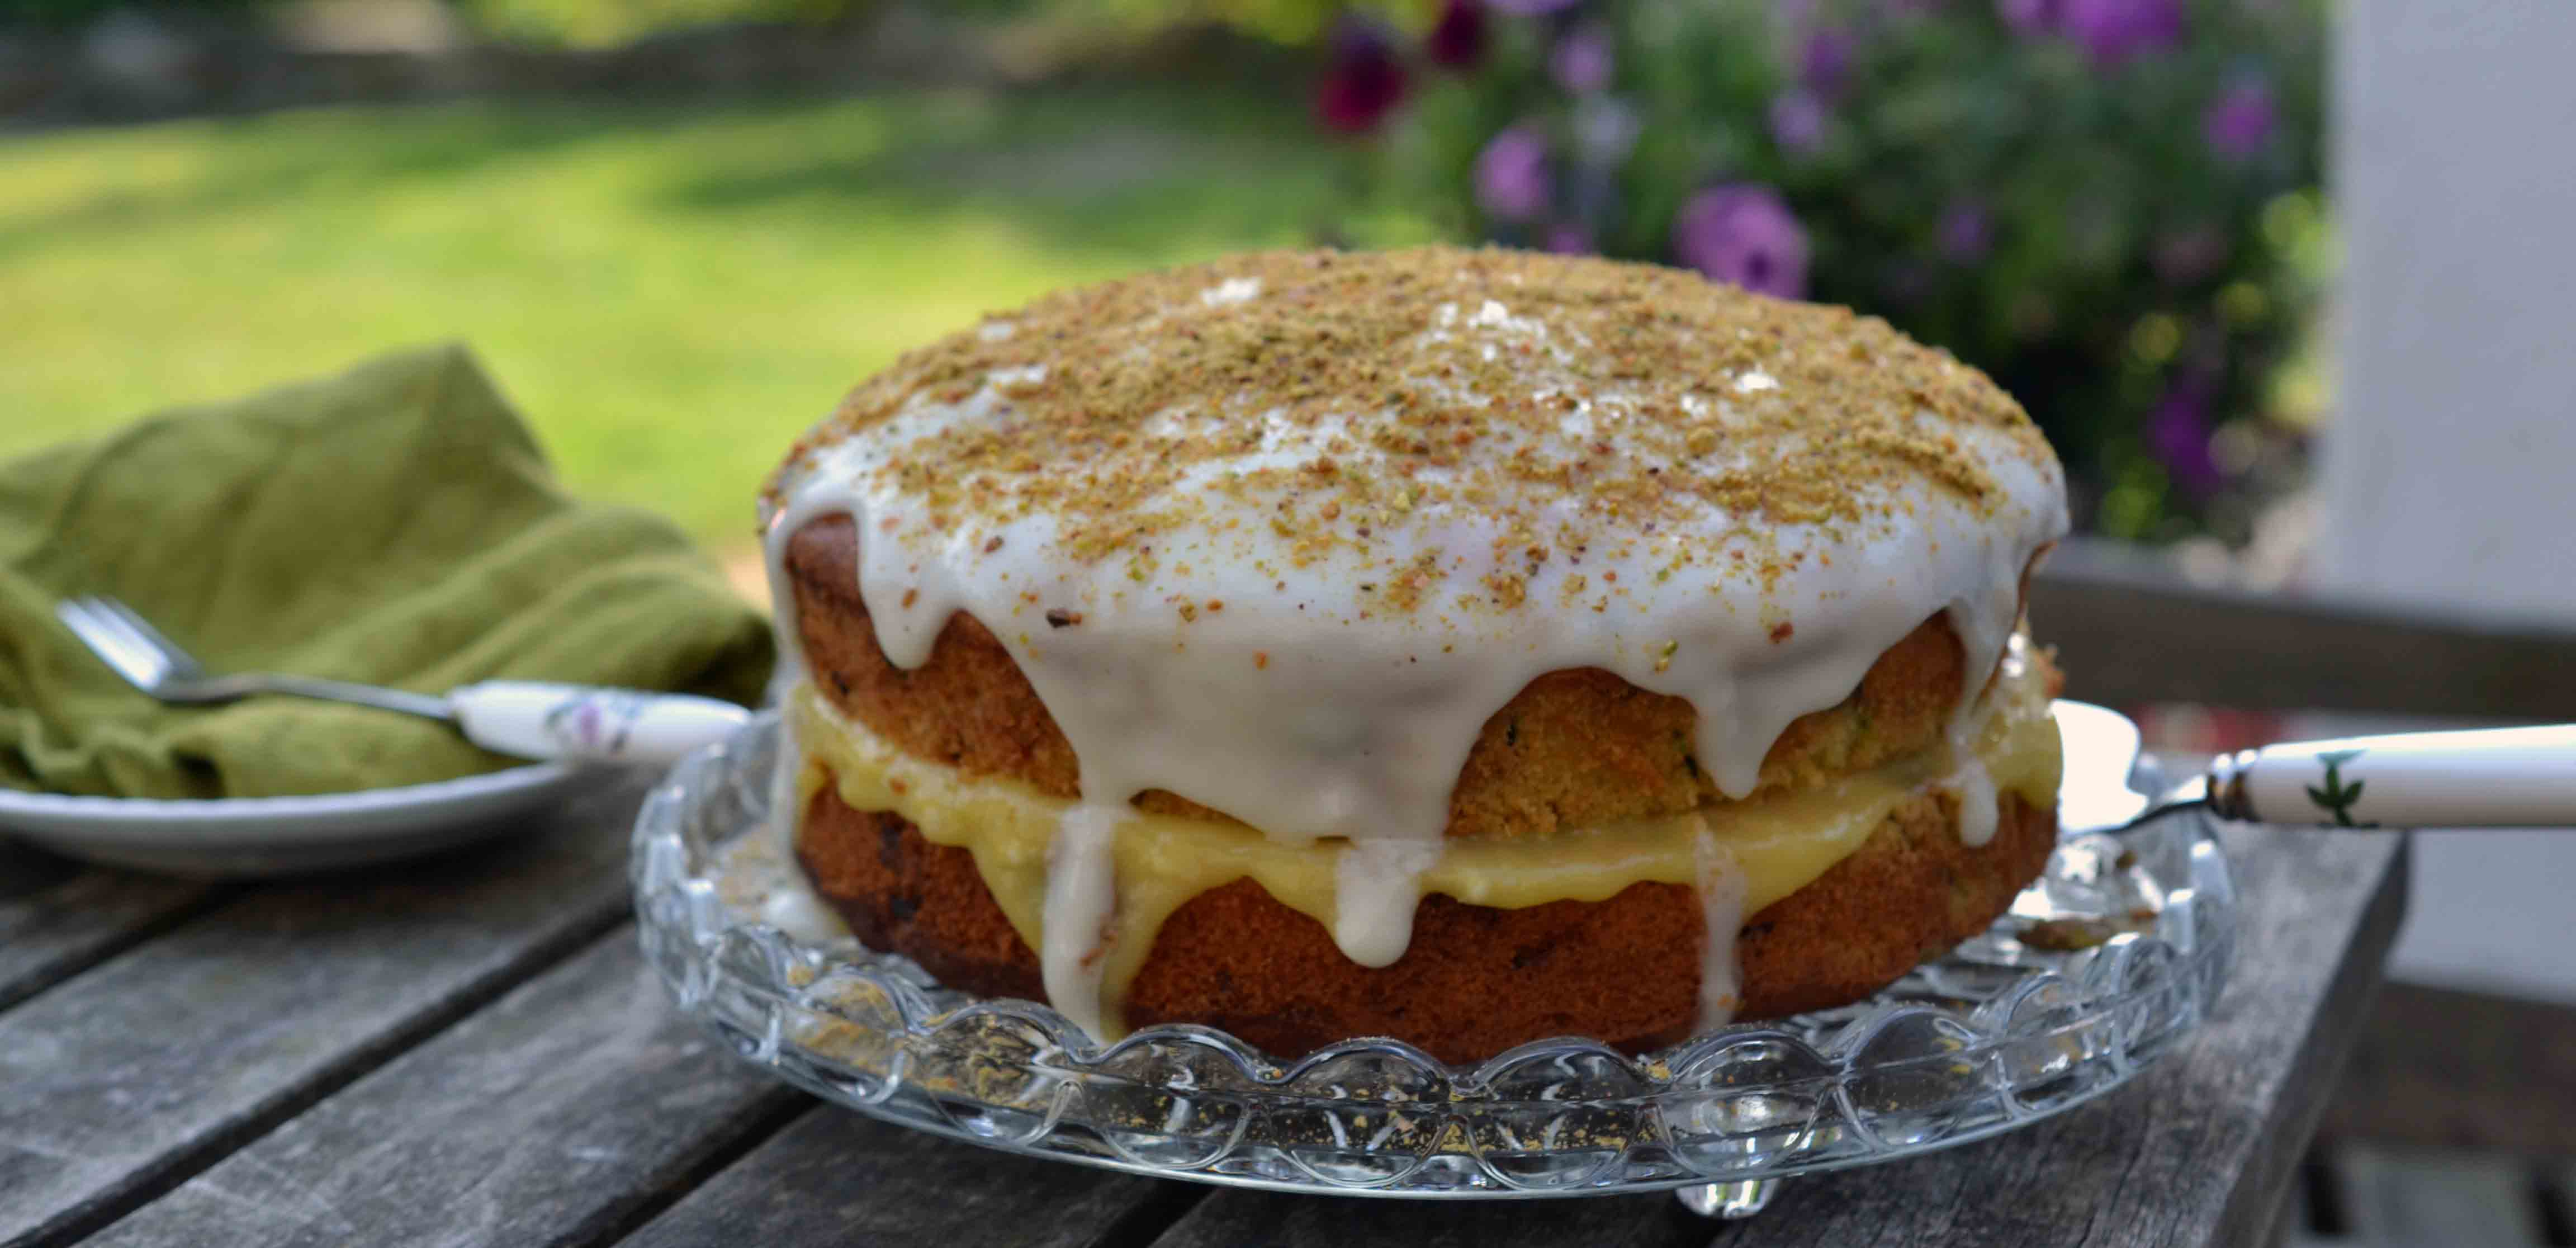 Courgette cake with Lemon, Lime & Pistachio